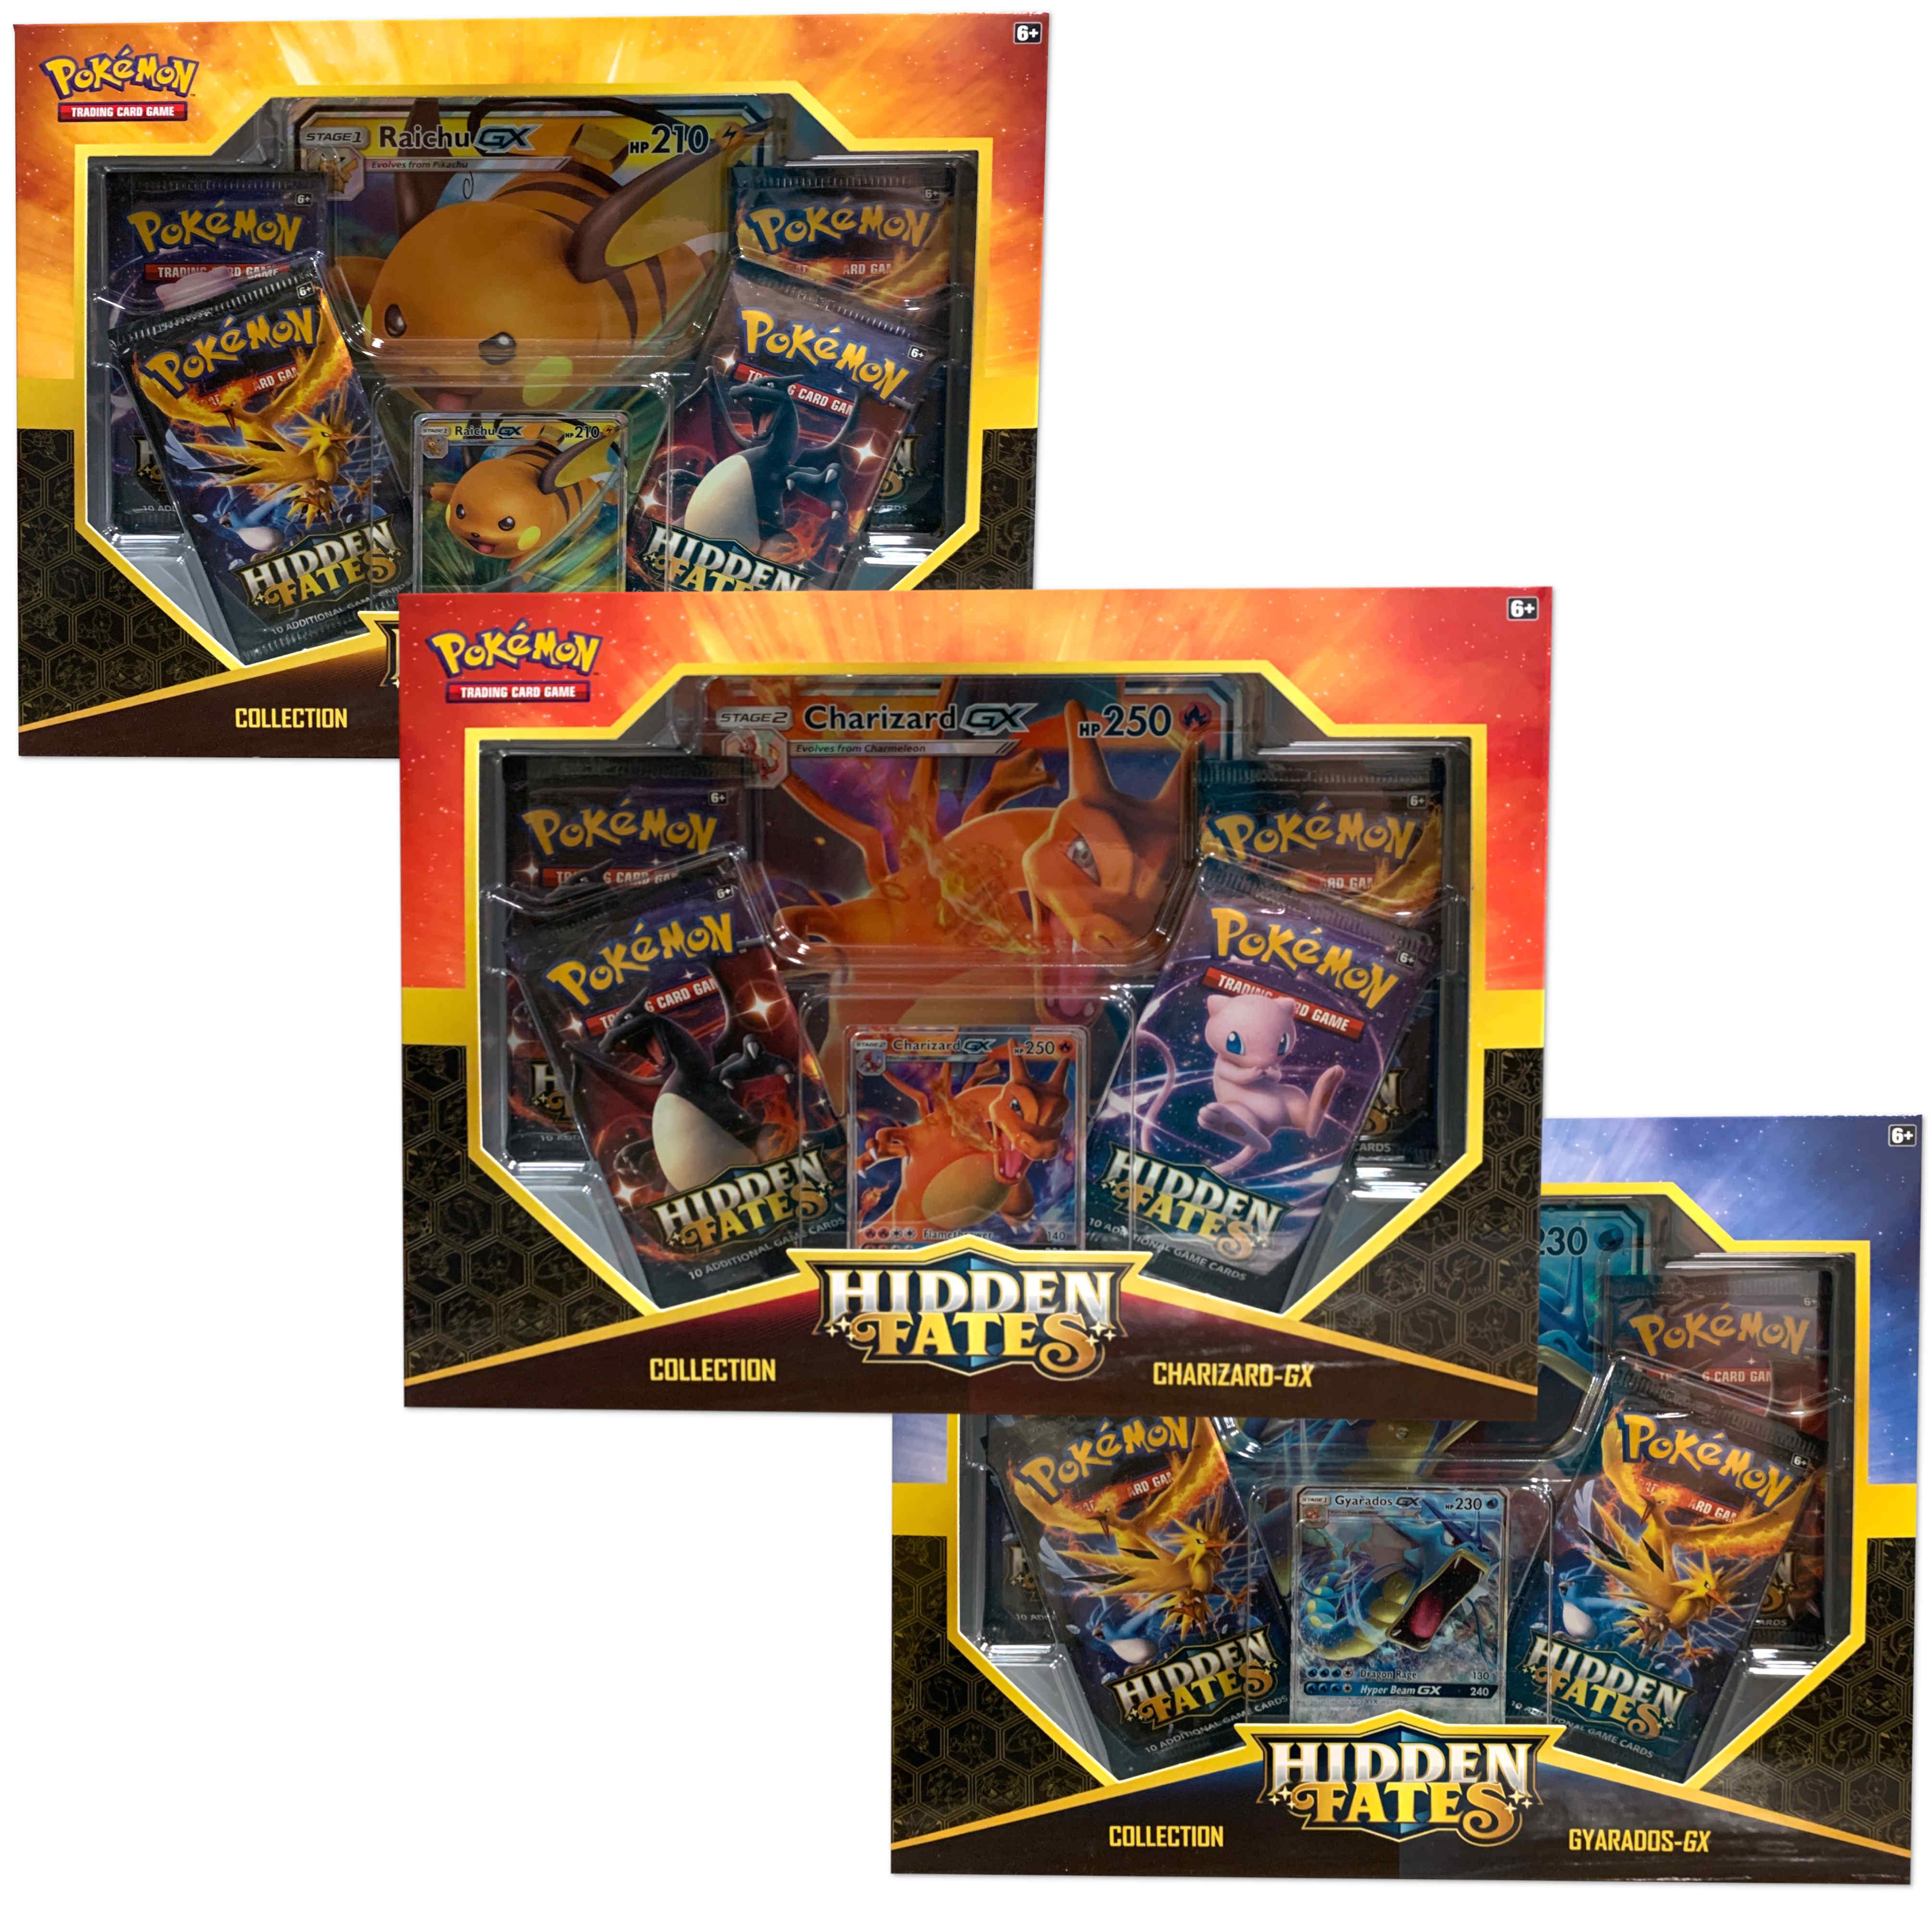 Pokemon Sun & Moon 11.5 Hidden Fates Assorted Gx Box- $20 WalMart In store only YMMV